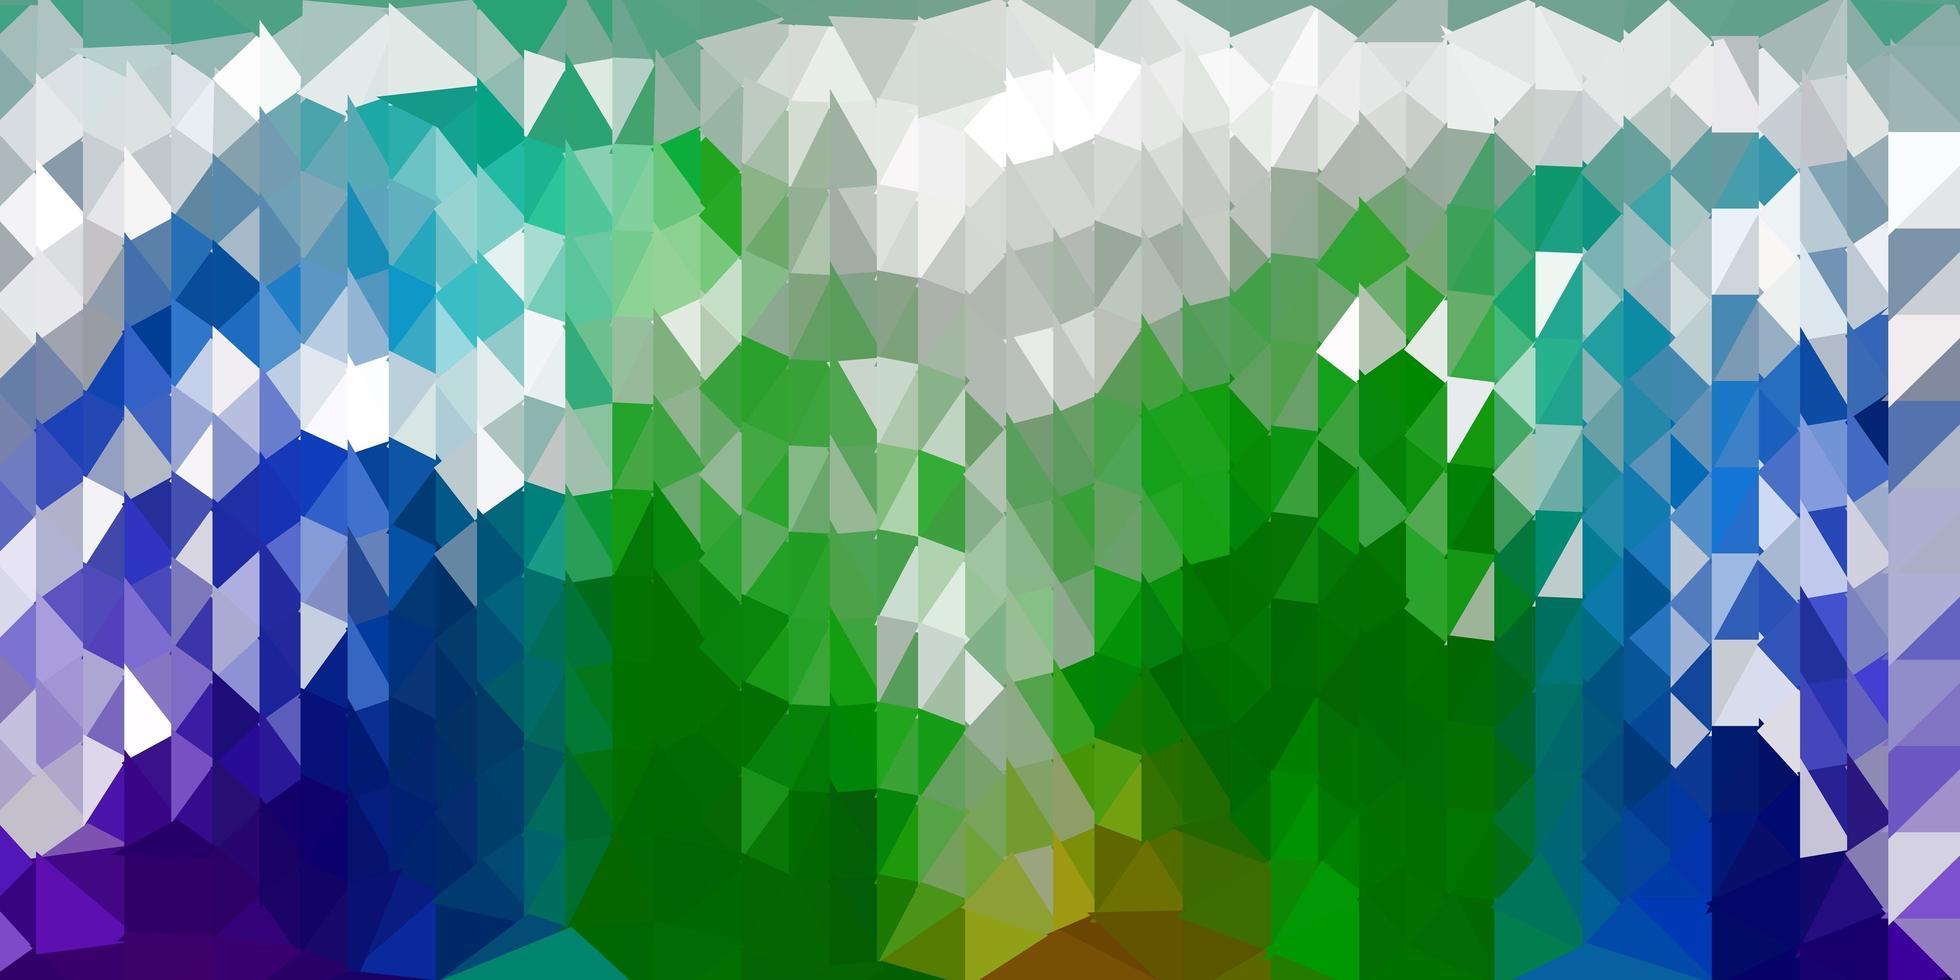 dunkelblaue, grüne Vektor abstrakte Dreiecksschablone.